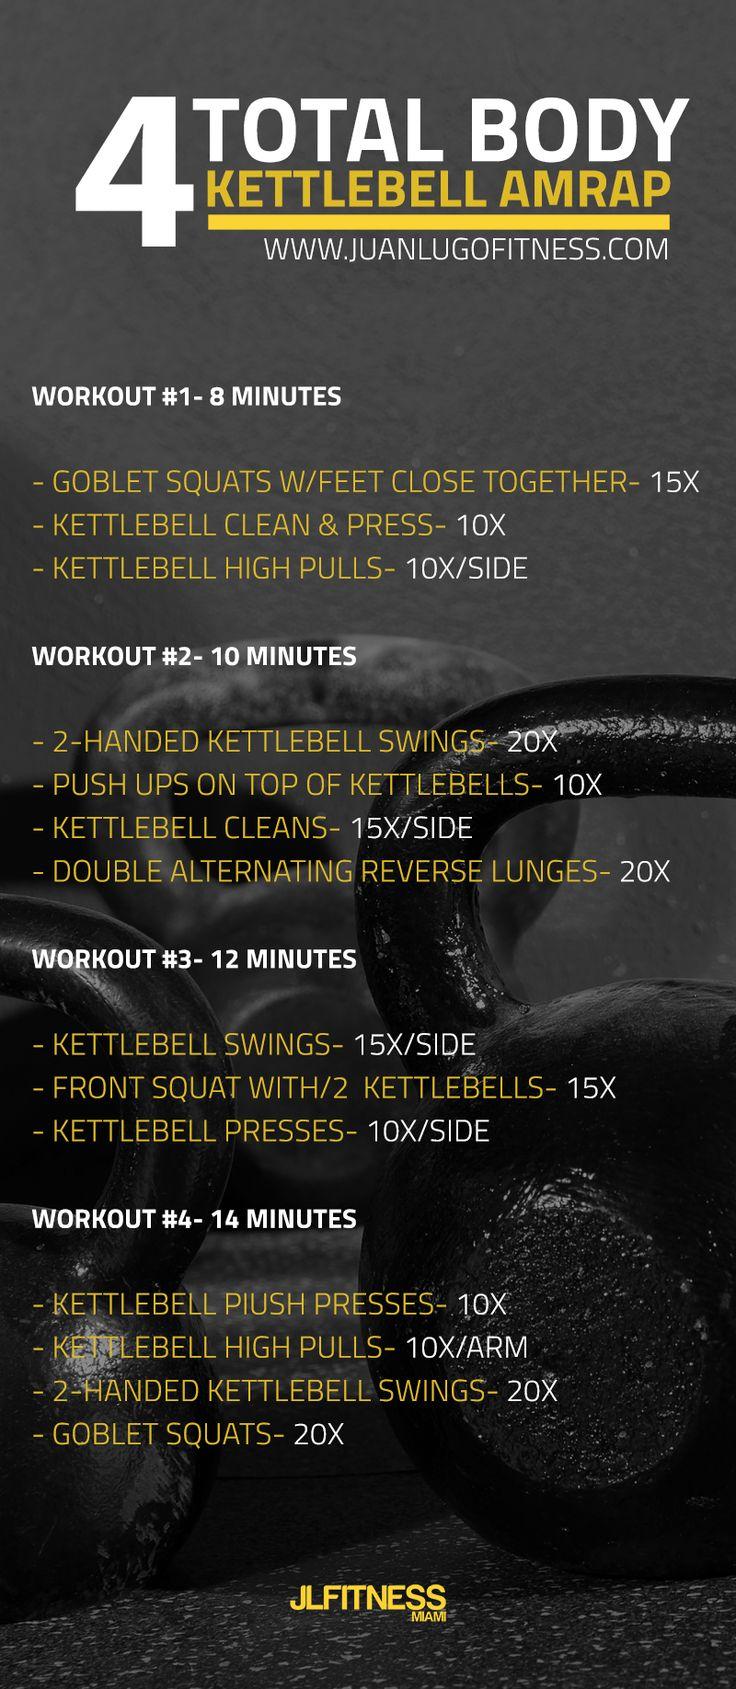 #kettlebell #workouts #wod #amrap #kettlebellworkouts